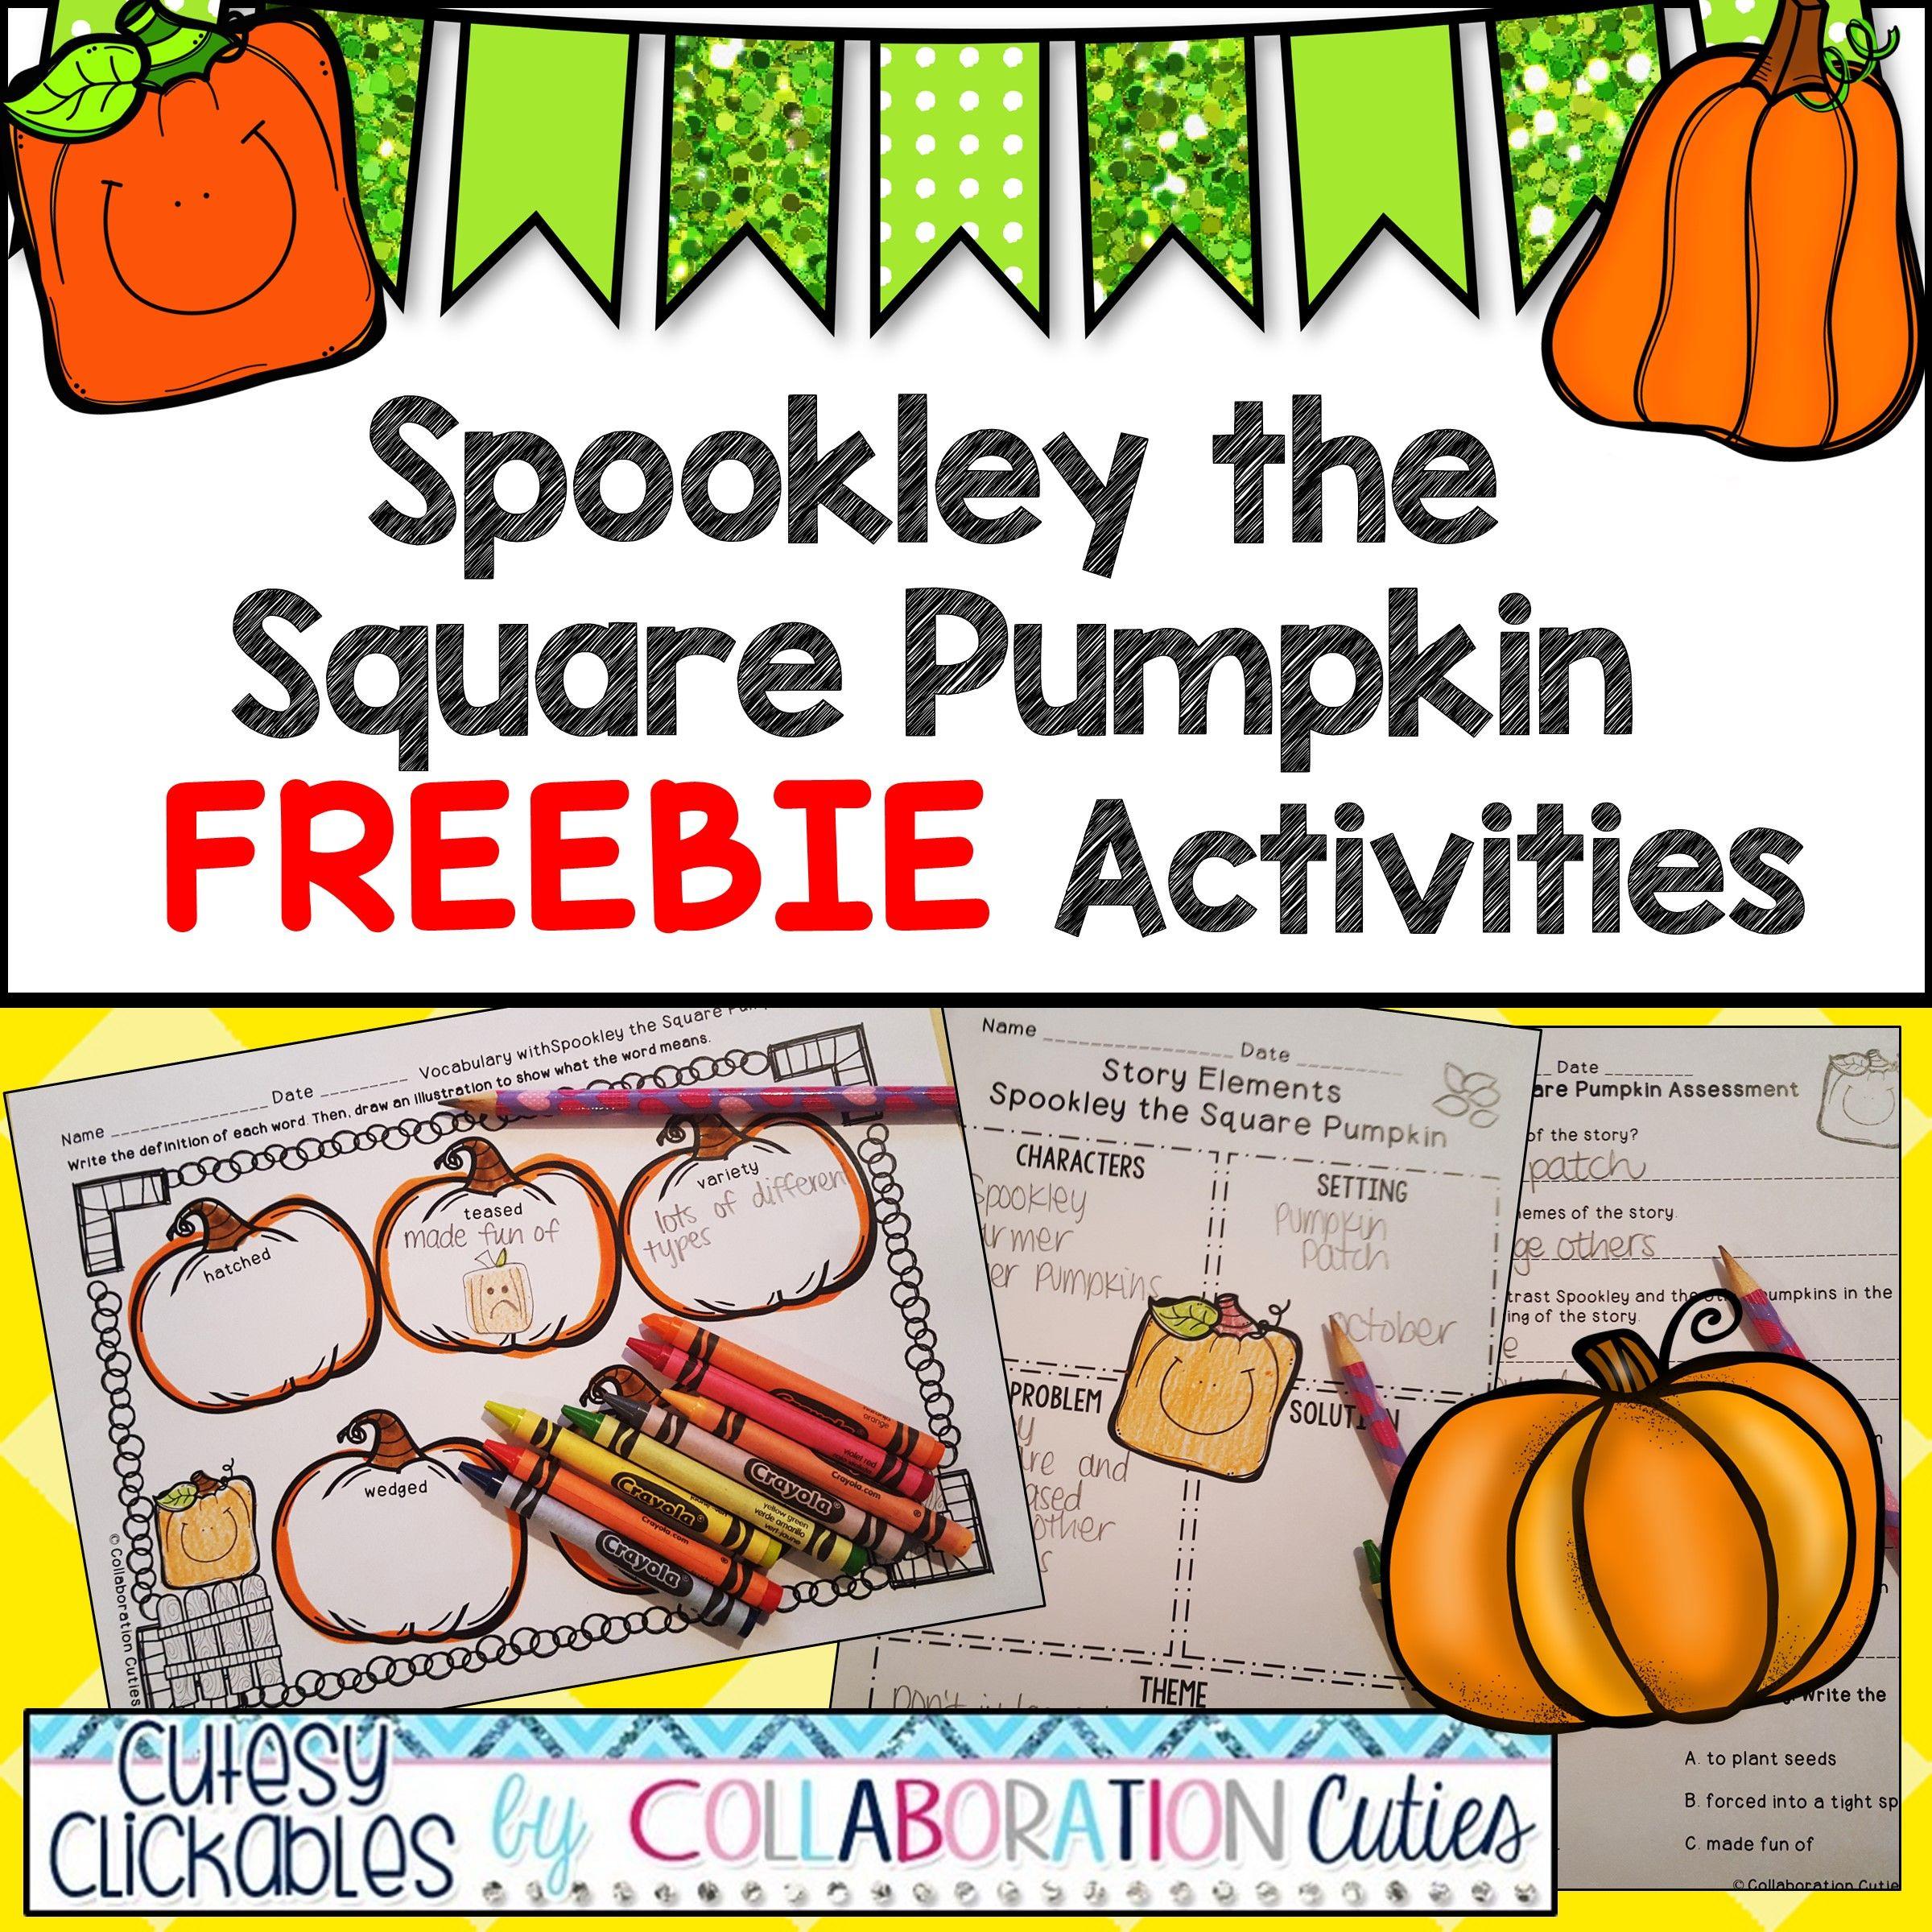 Spookley The Square Pumpkin Freebie Activities Assessment